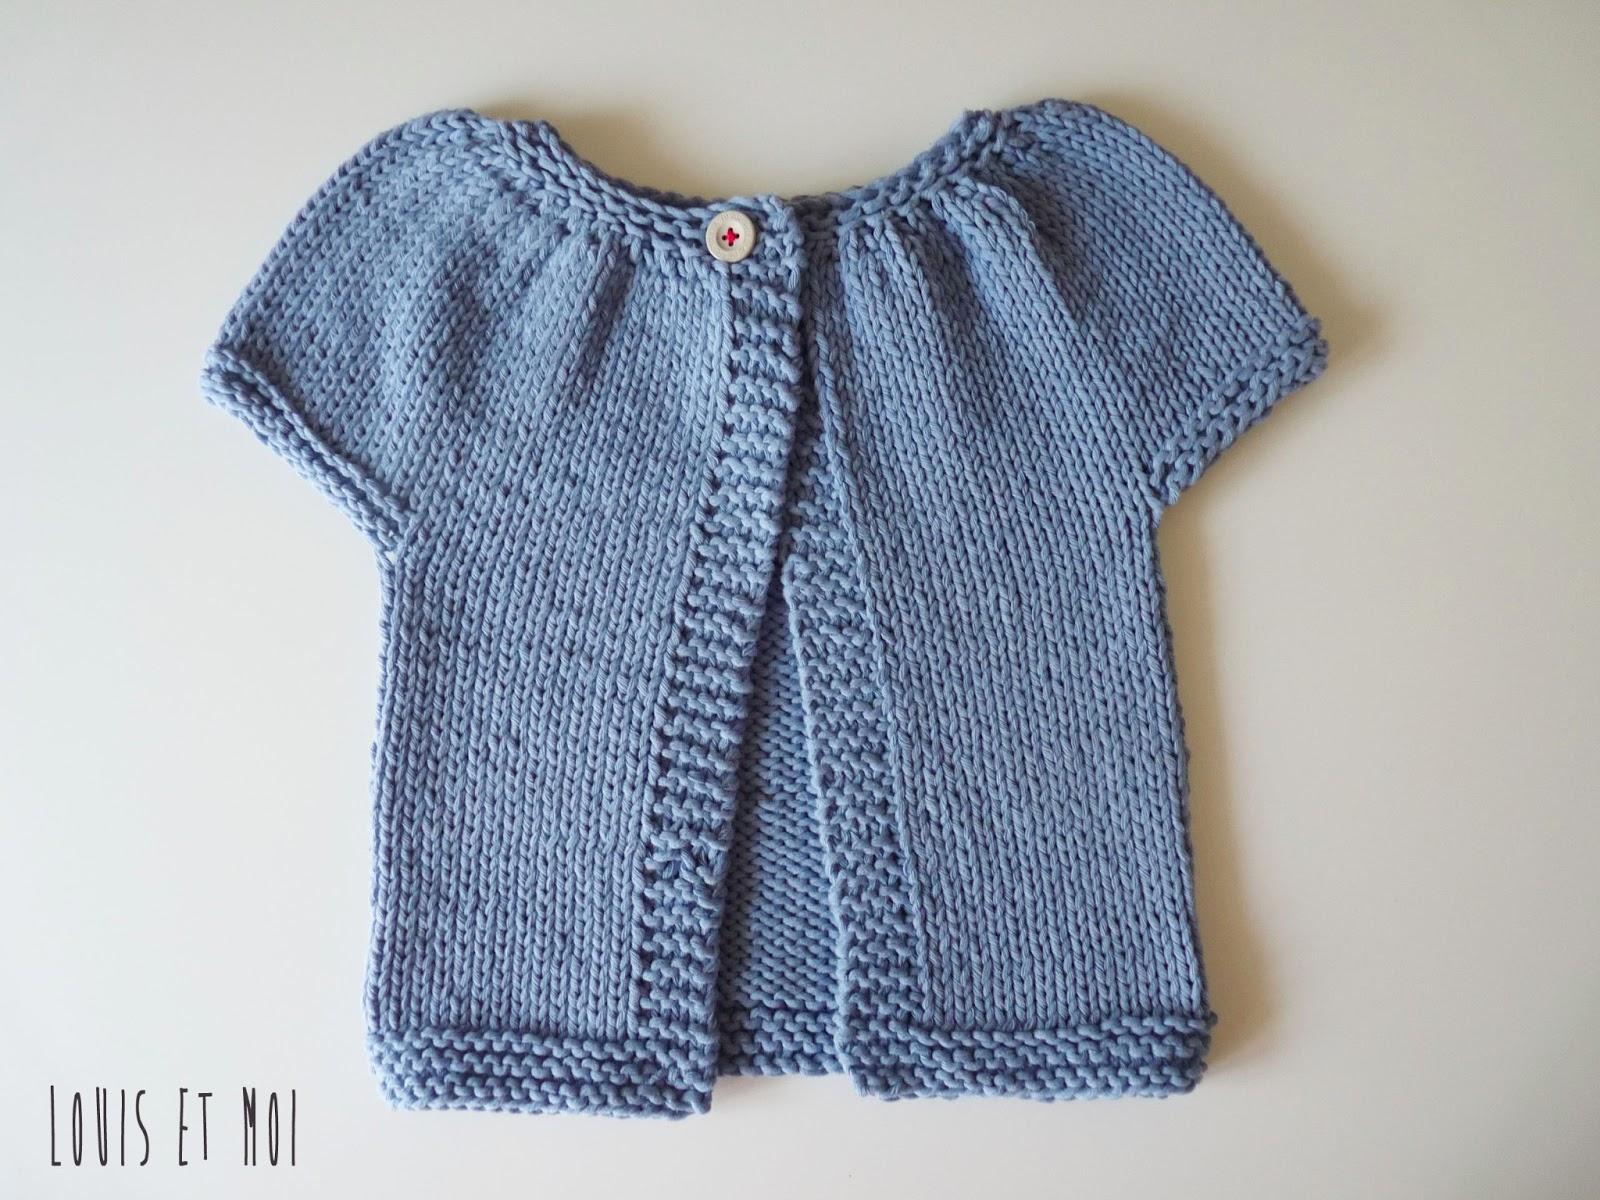 Louis et Moi (cosen y hacen crochet): Mi primera chaqueta, chispas!!